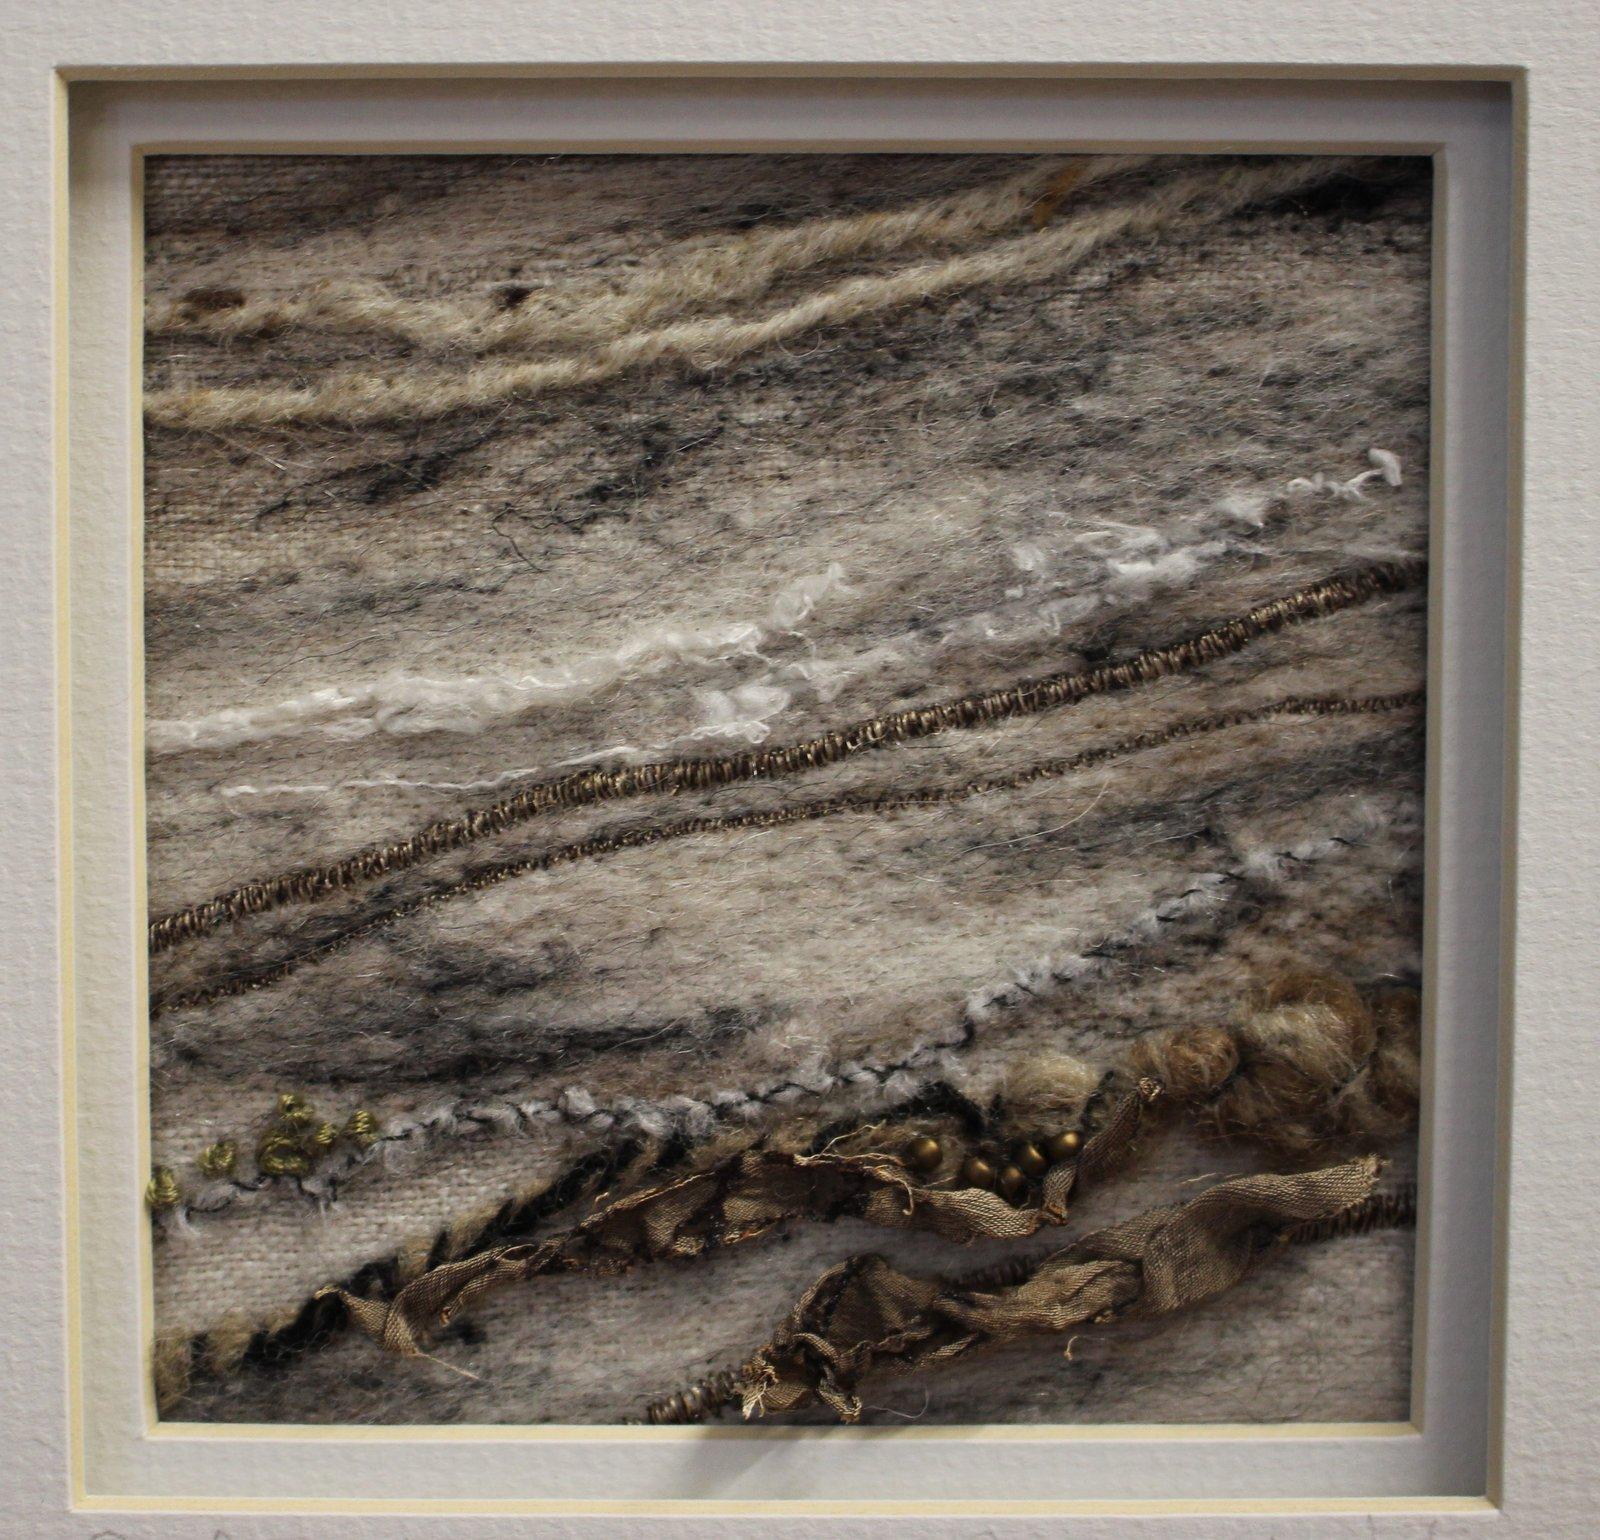 Textile Art Driftwood Shoreline on linen